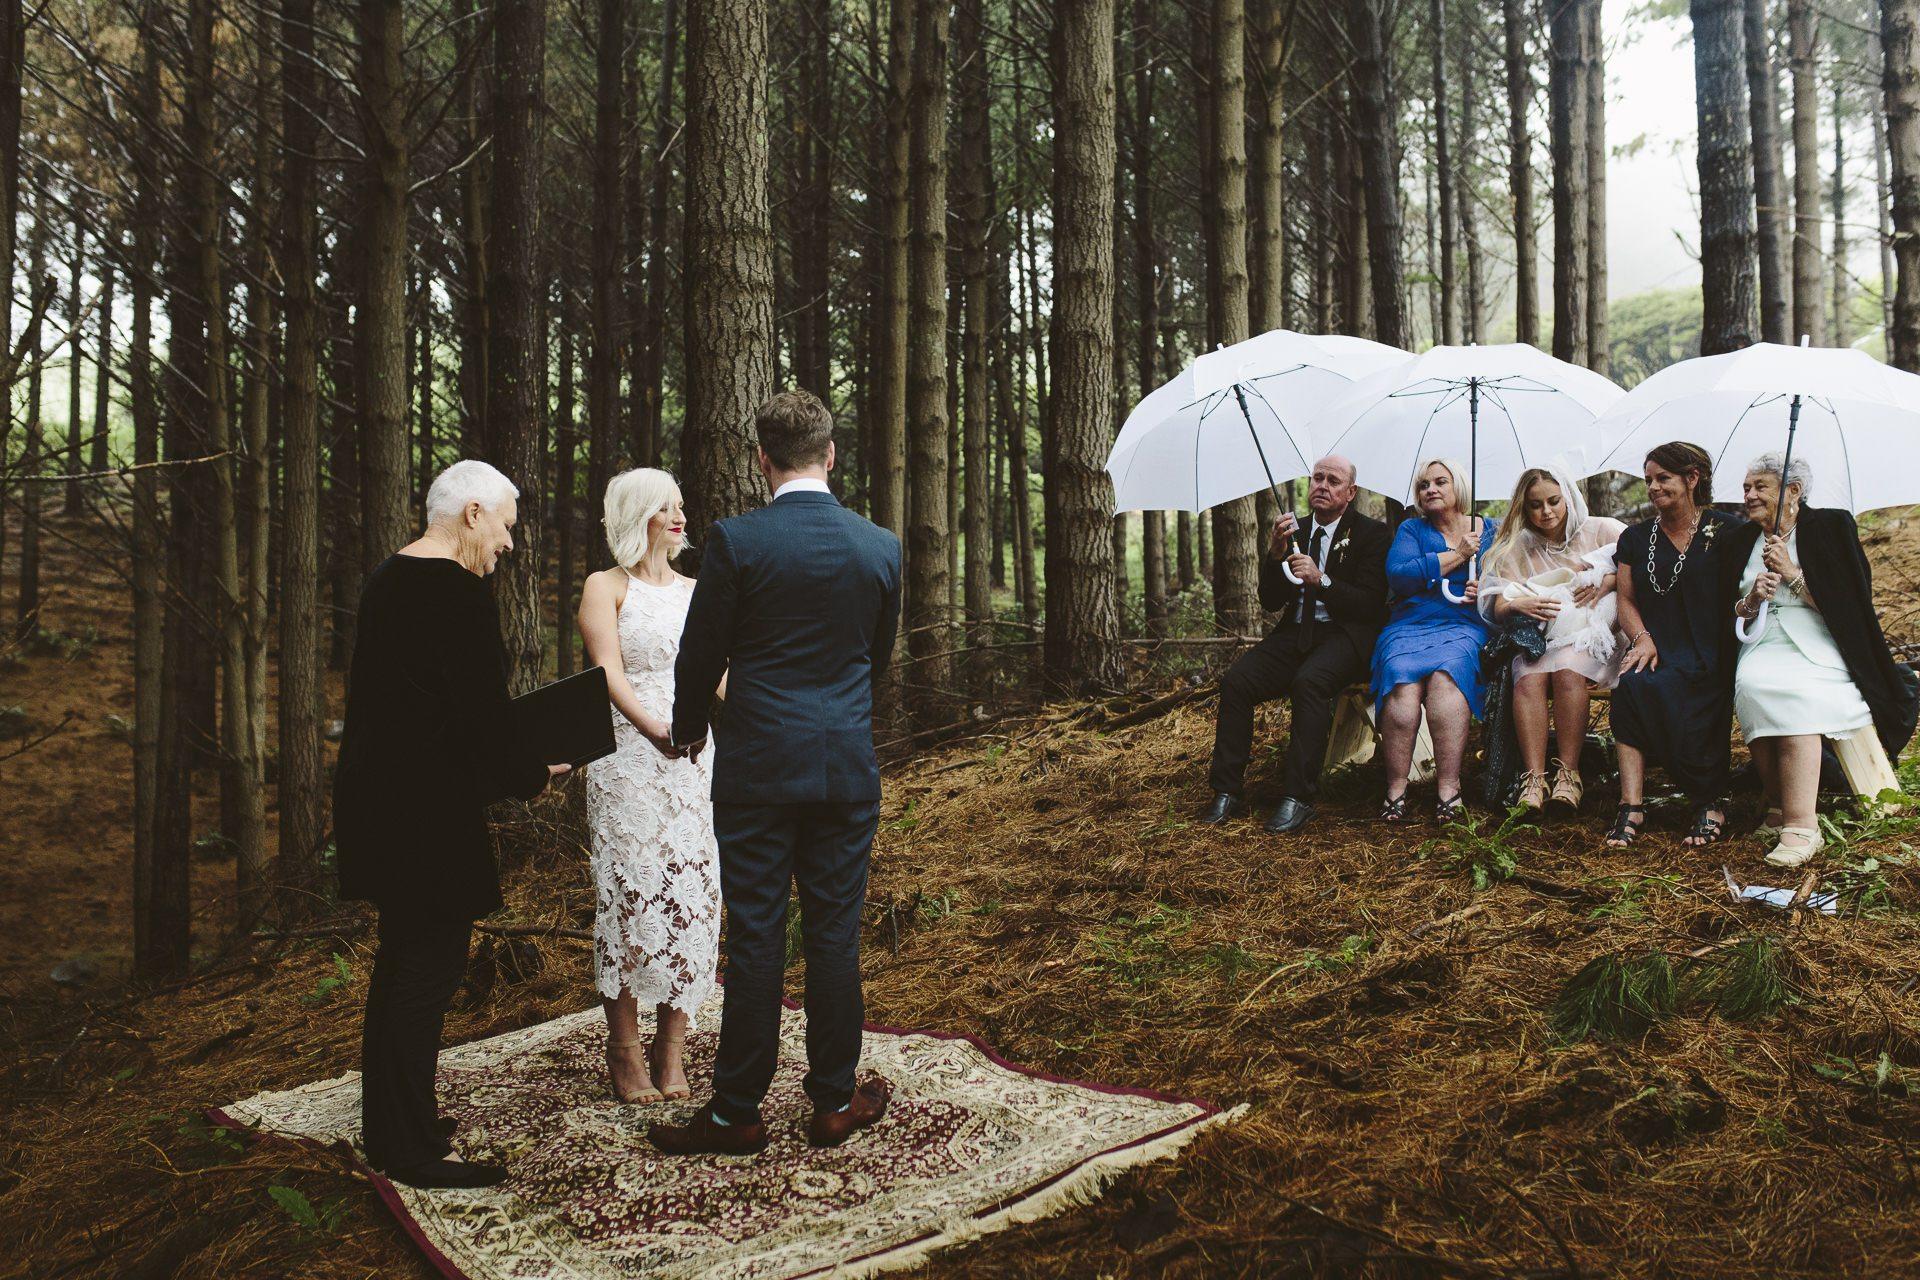 hamilton-wedding-portrait-photographer-at-151